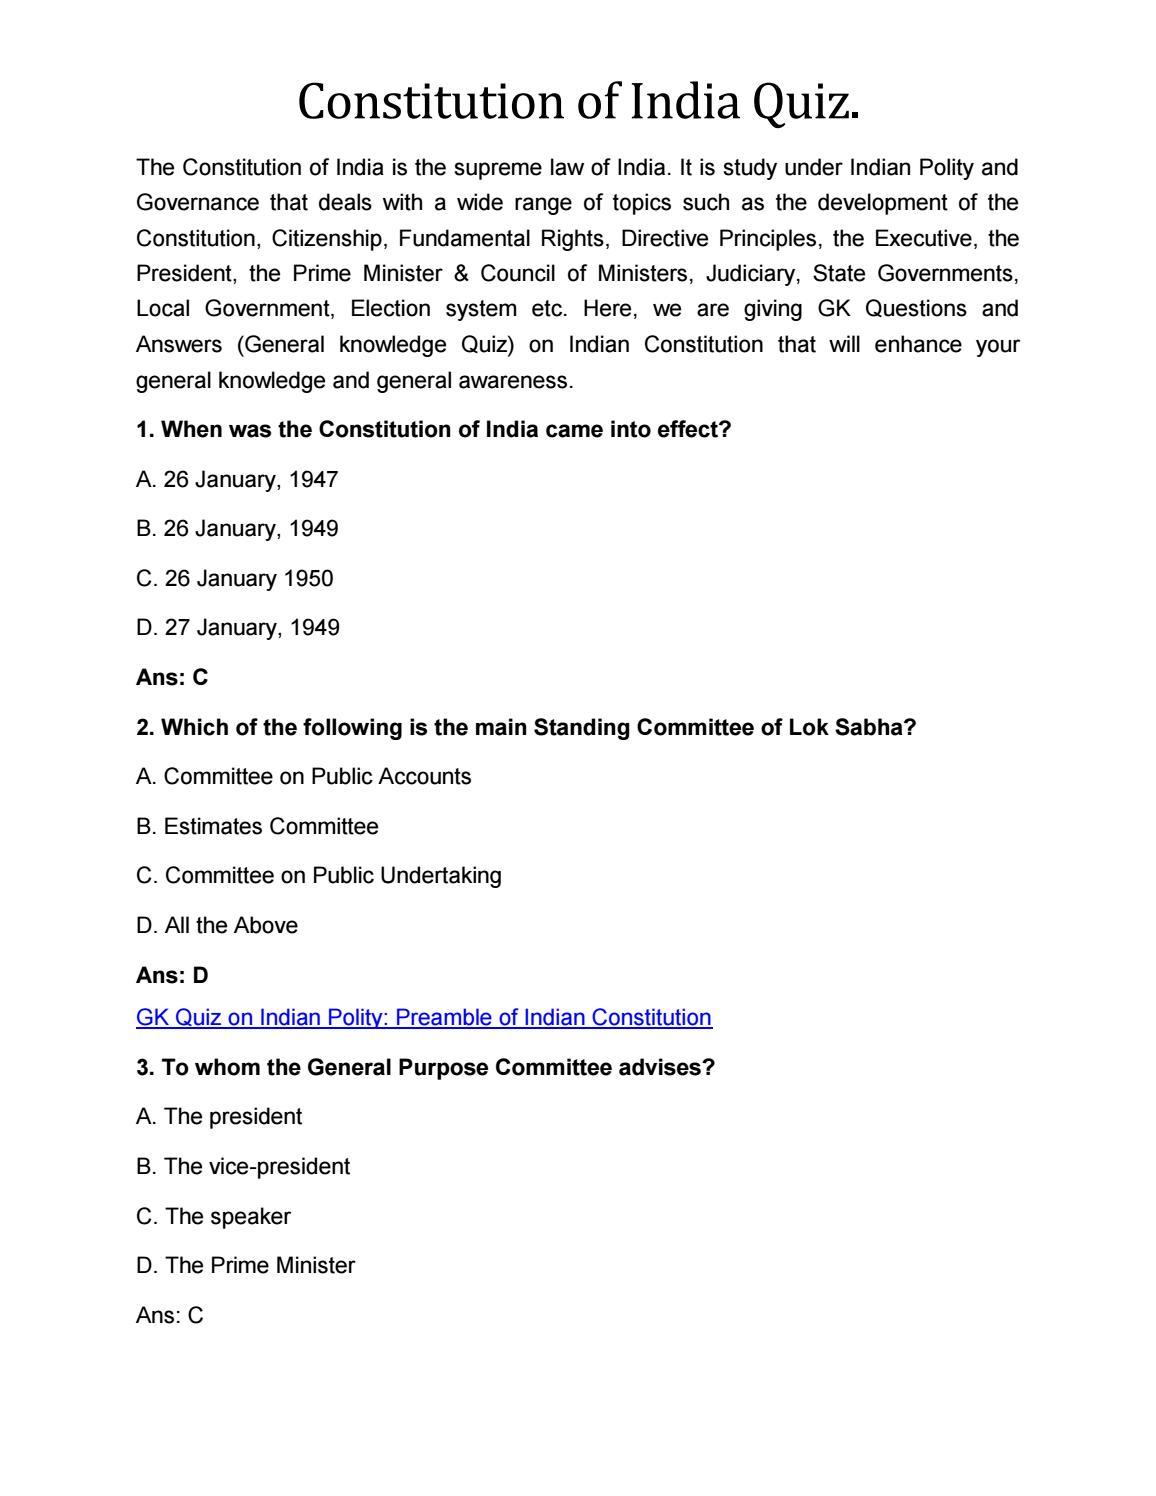 Constitution of India संविधान के भाग विषय